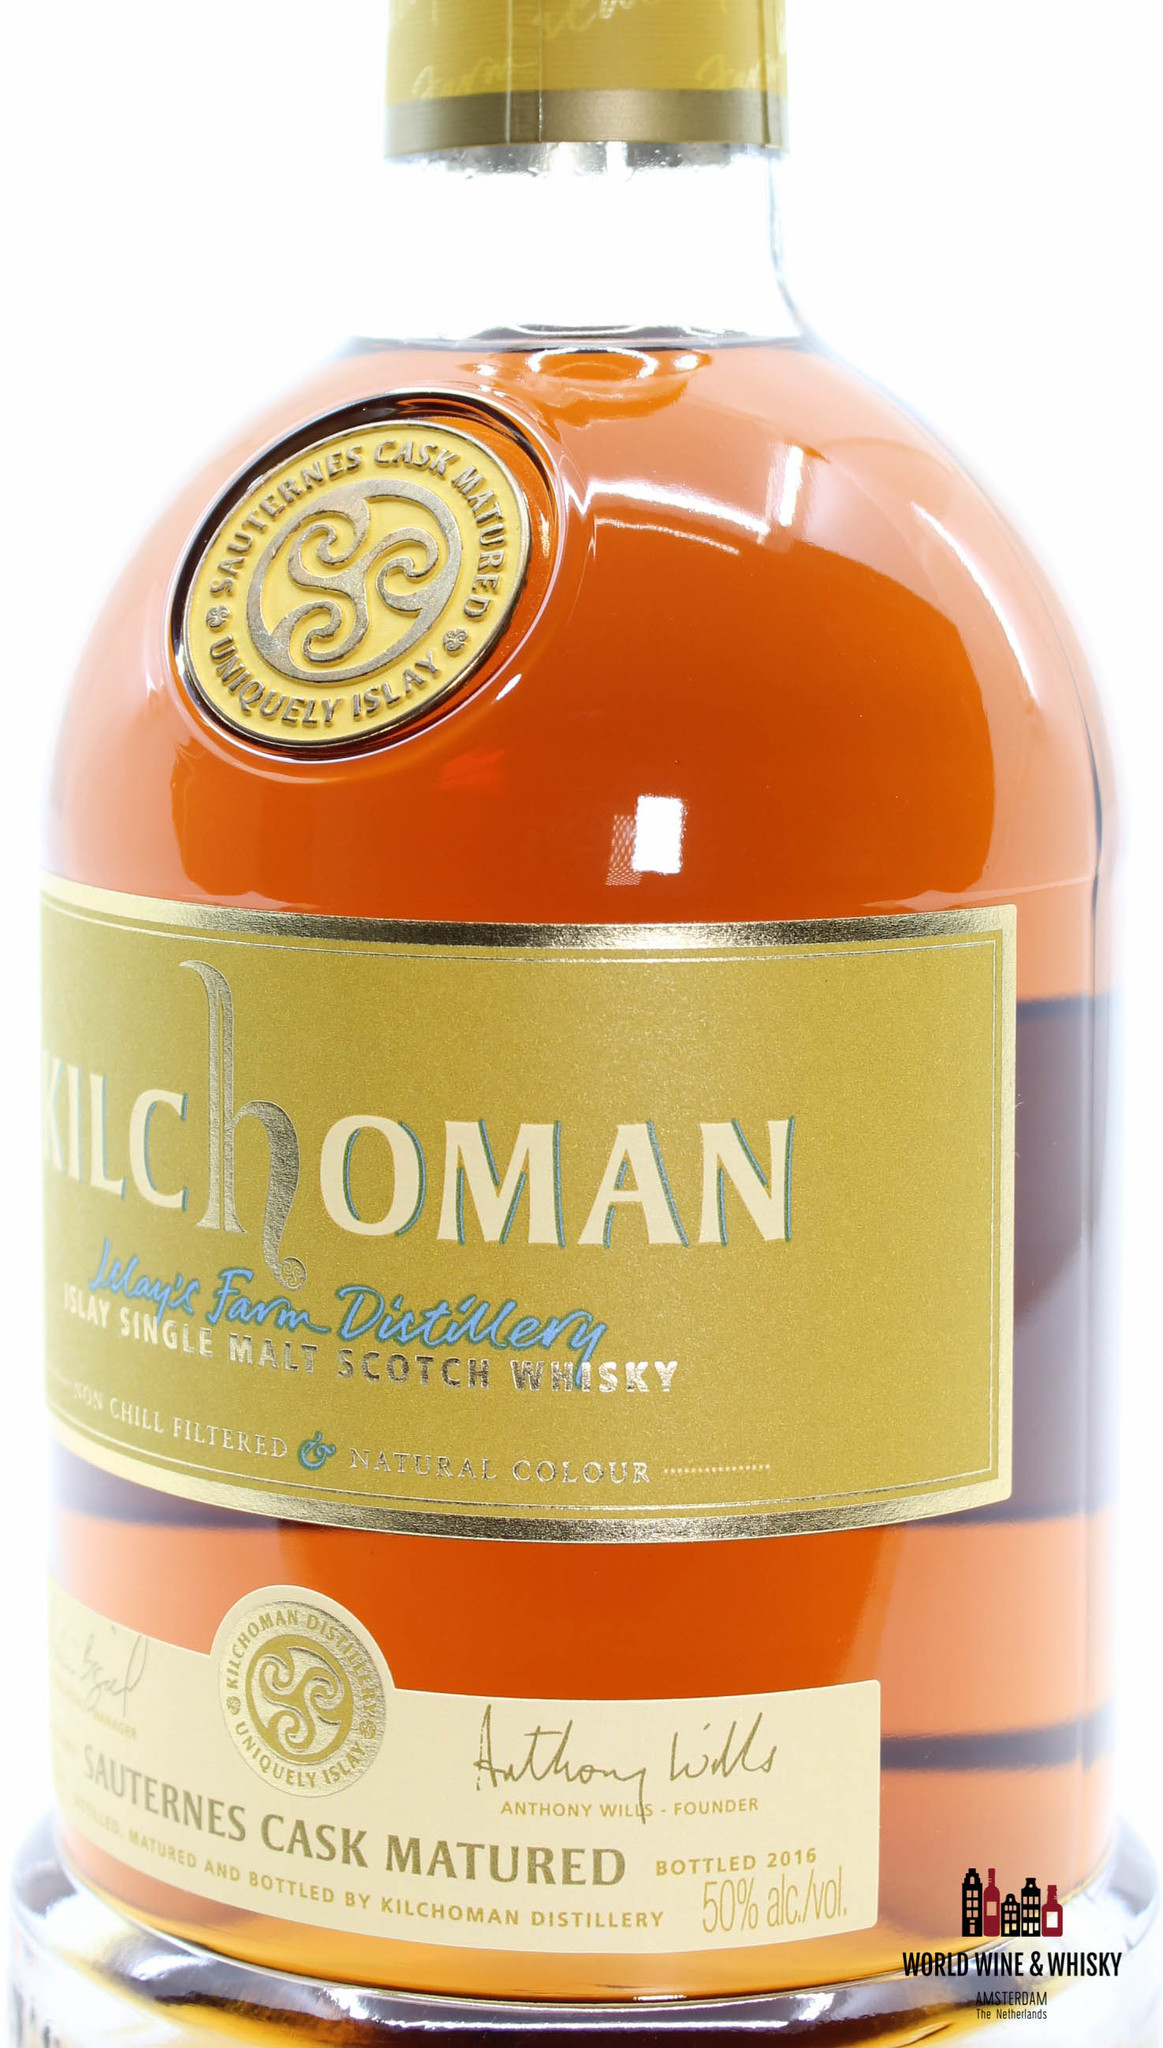 Kilchoman Kilchoman 5 Years Old 2011 2016 Sauternes Cask Matured 50% (one of 6000 bottles)